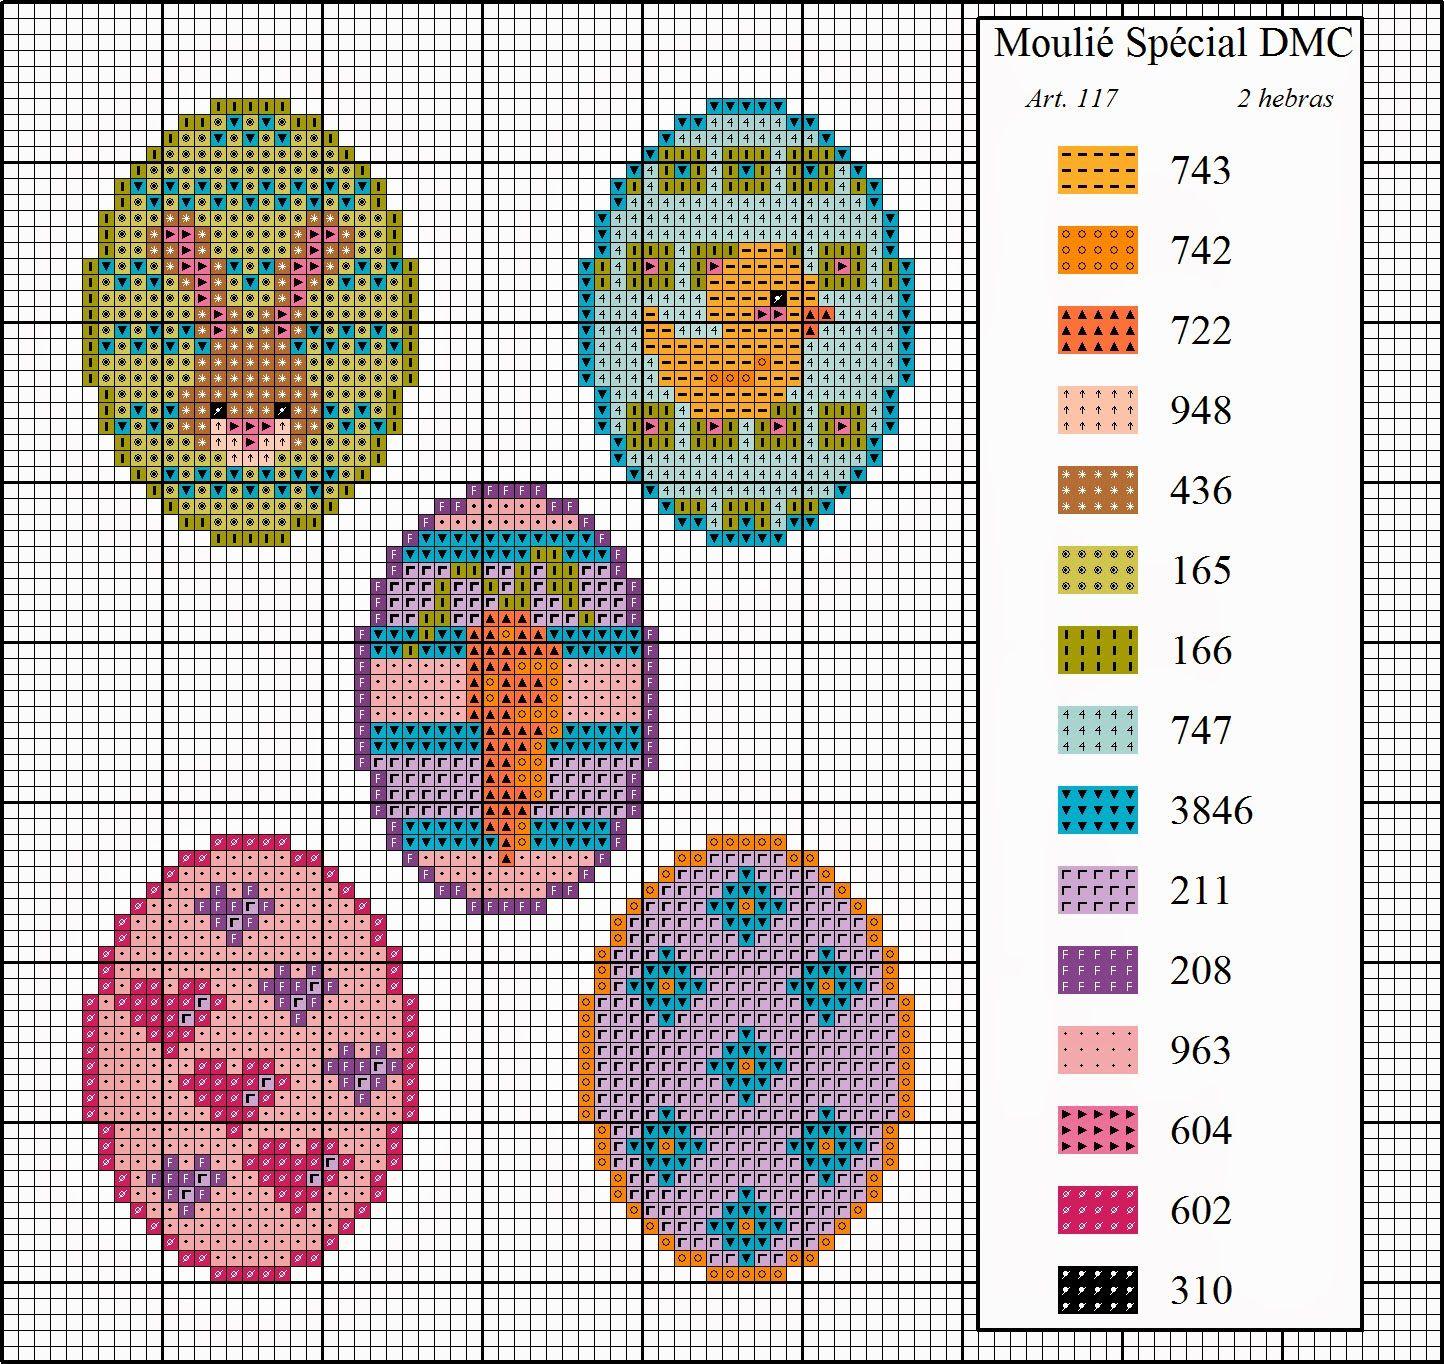 El blog de Dmc: Diagramas de pascua   Manualidades   Pinterest ...